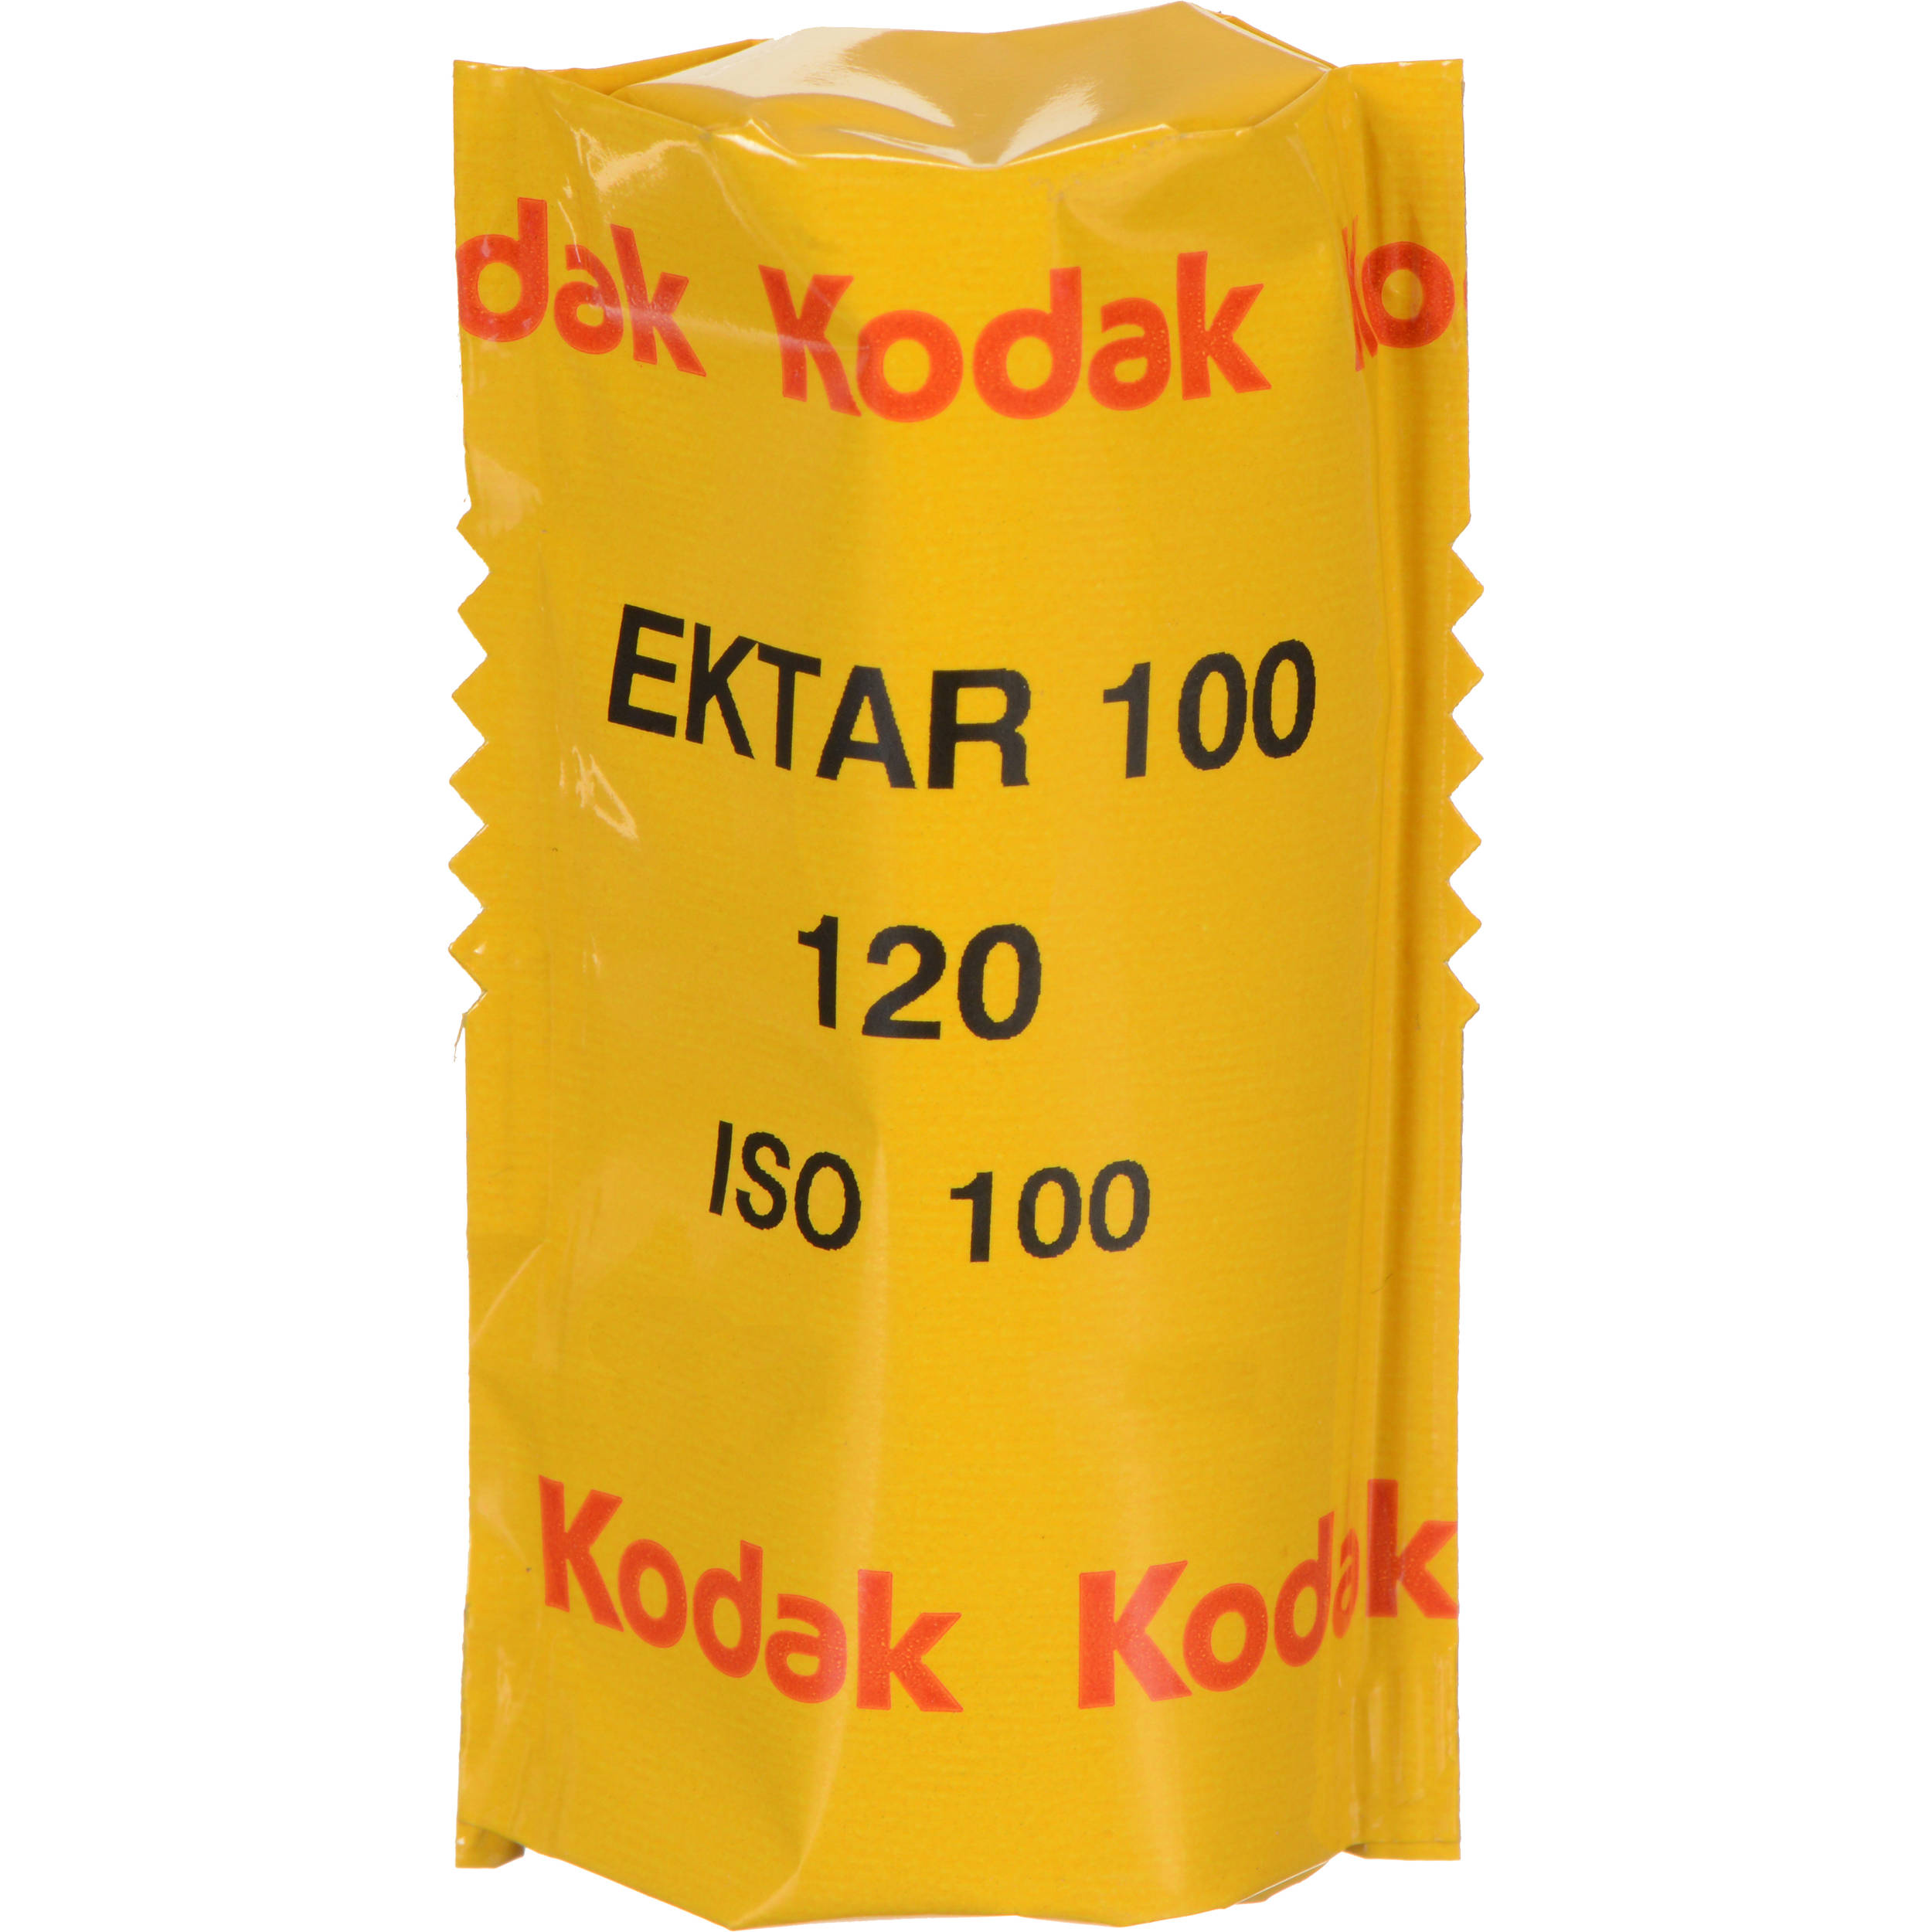 Kodak Professional Ektar 100 Color Negative Film 120 Roll